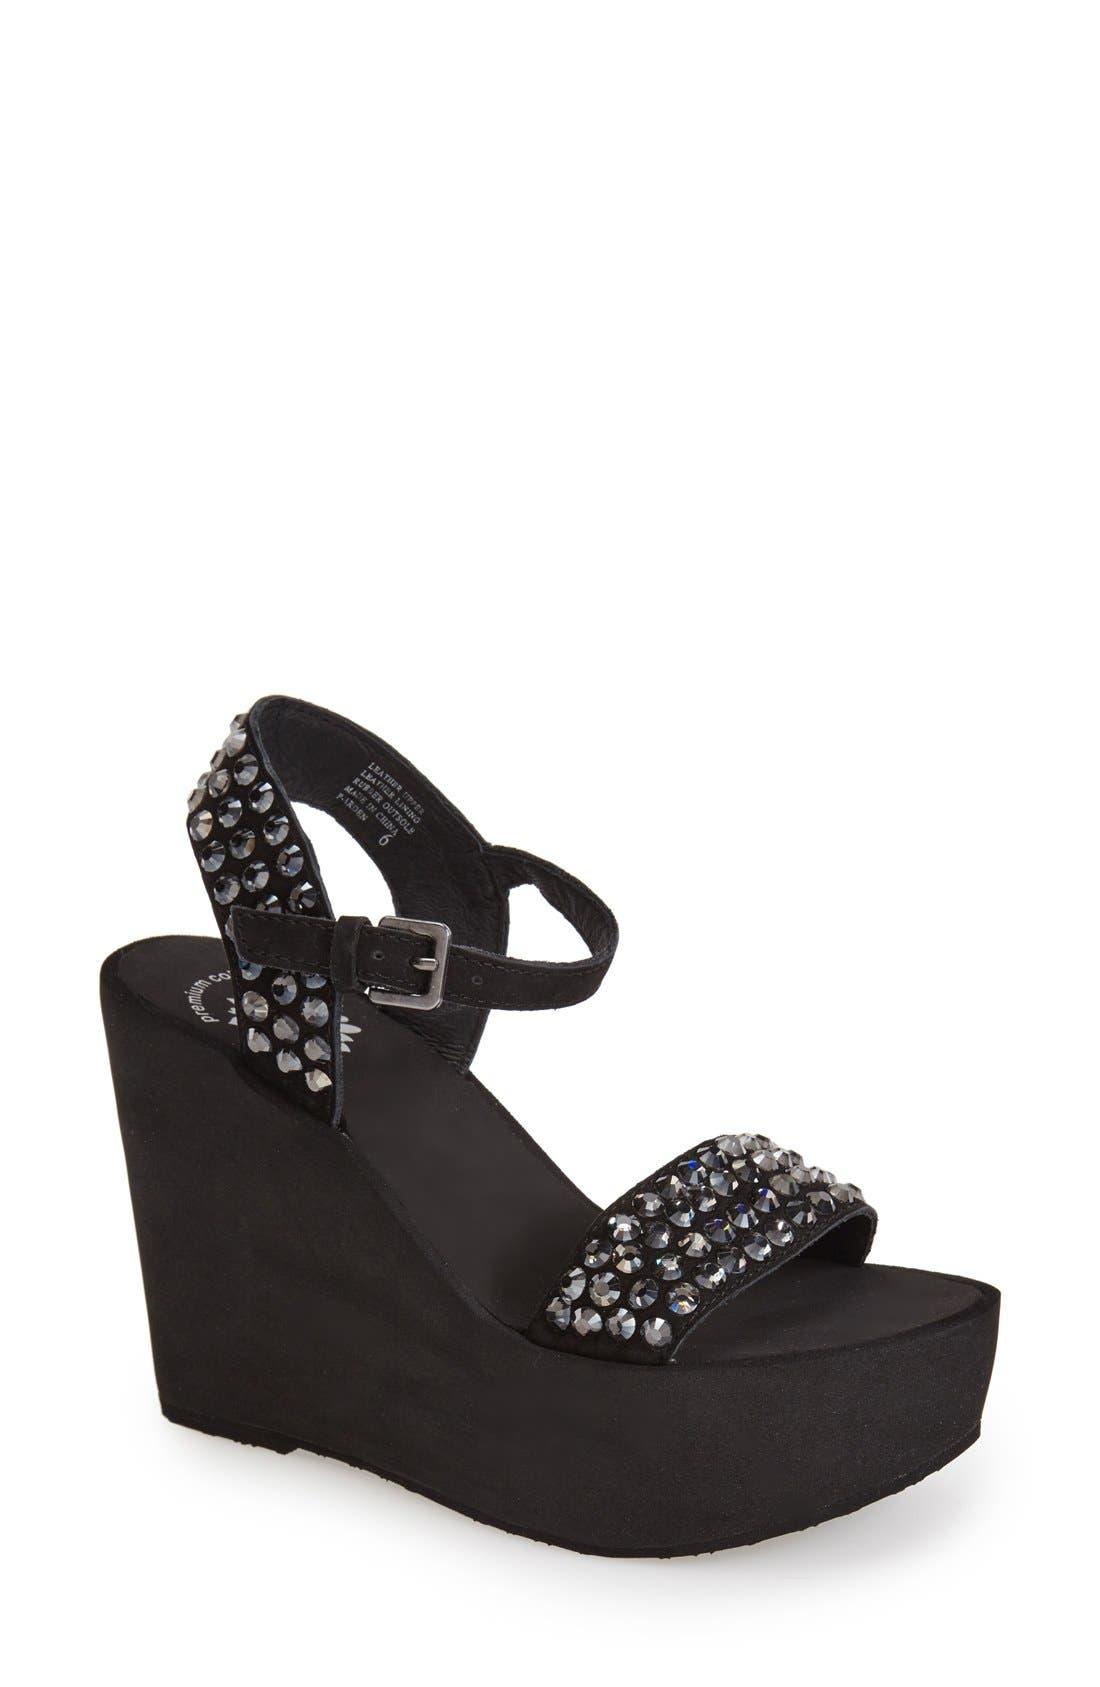 Main Image - Yellowbox 'Arden' Crystal Embellished Wedge Sandal (Women)